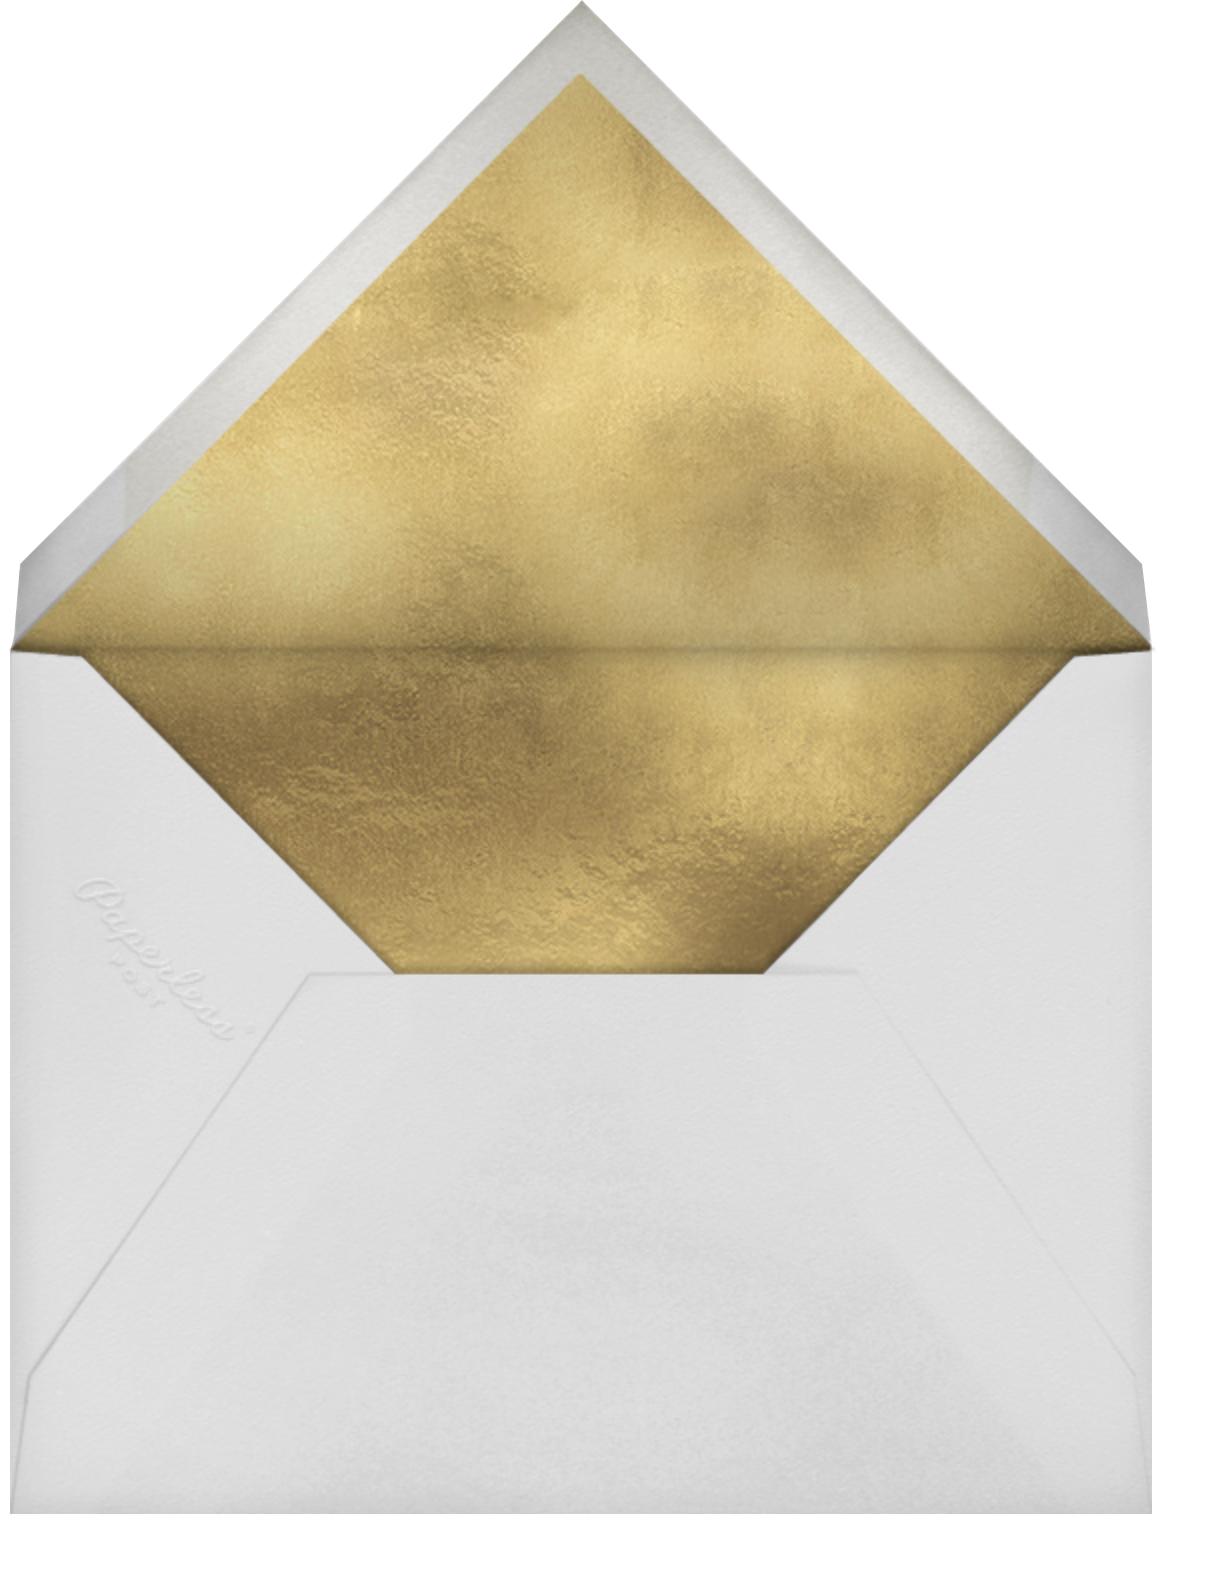 Garden Spells - Black - Oscar de la Renta - Dinner and luncheon - envelope back